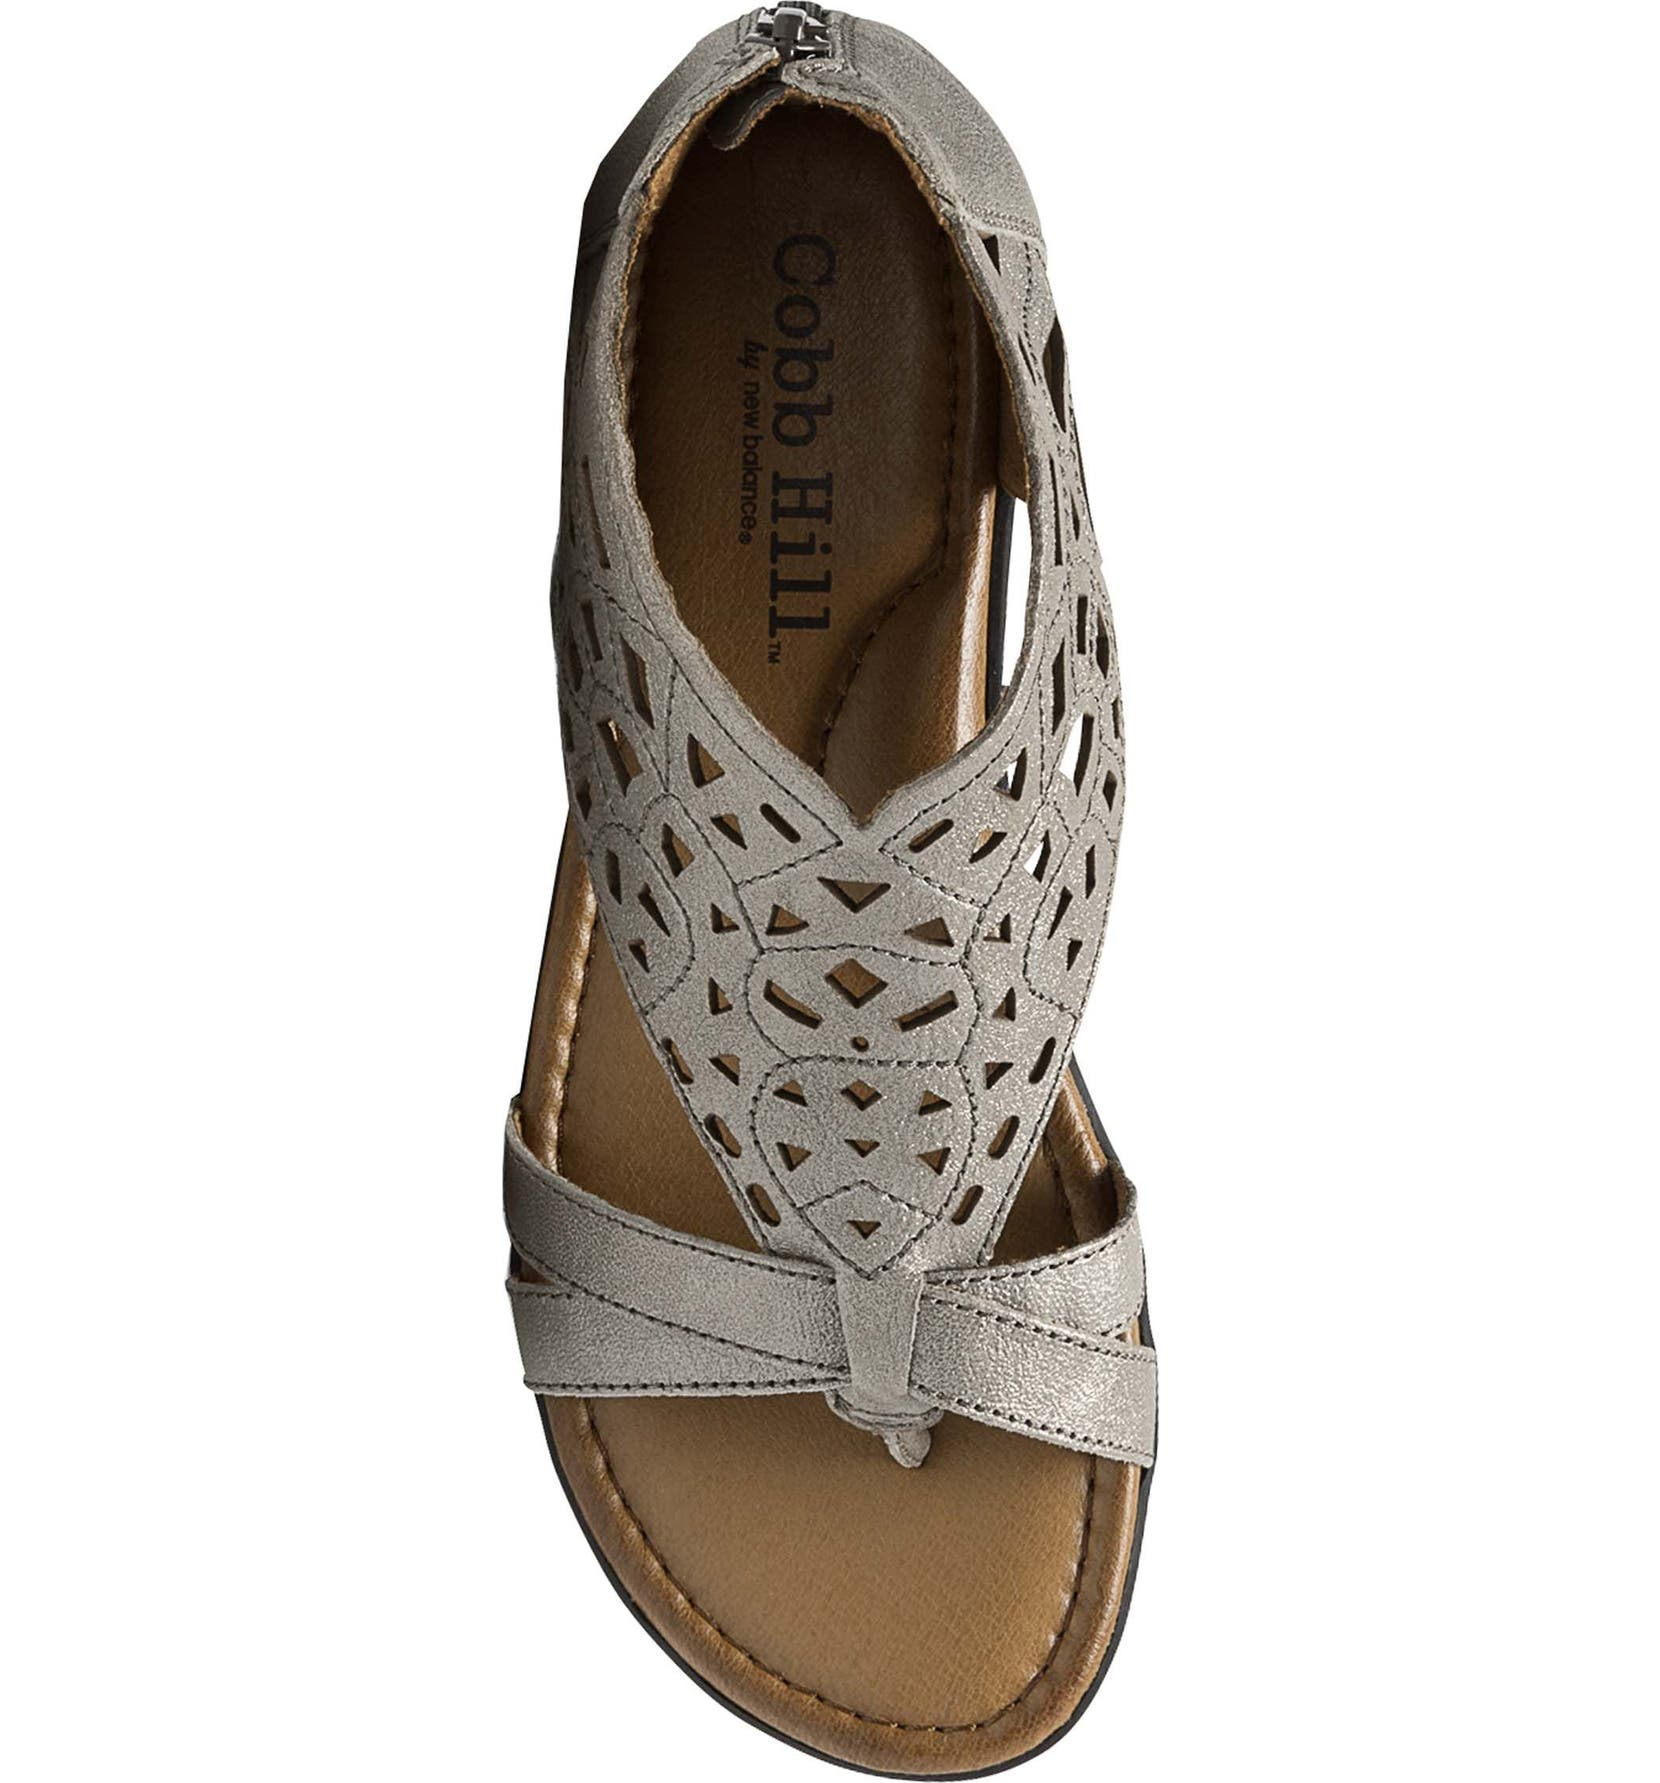 81d858eeb61 Rockport Cobb Hill 'Jordan' Sandal (Women) | Nordstrom